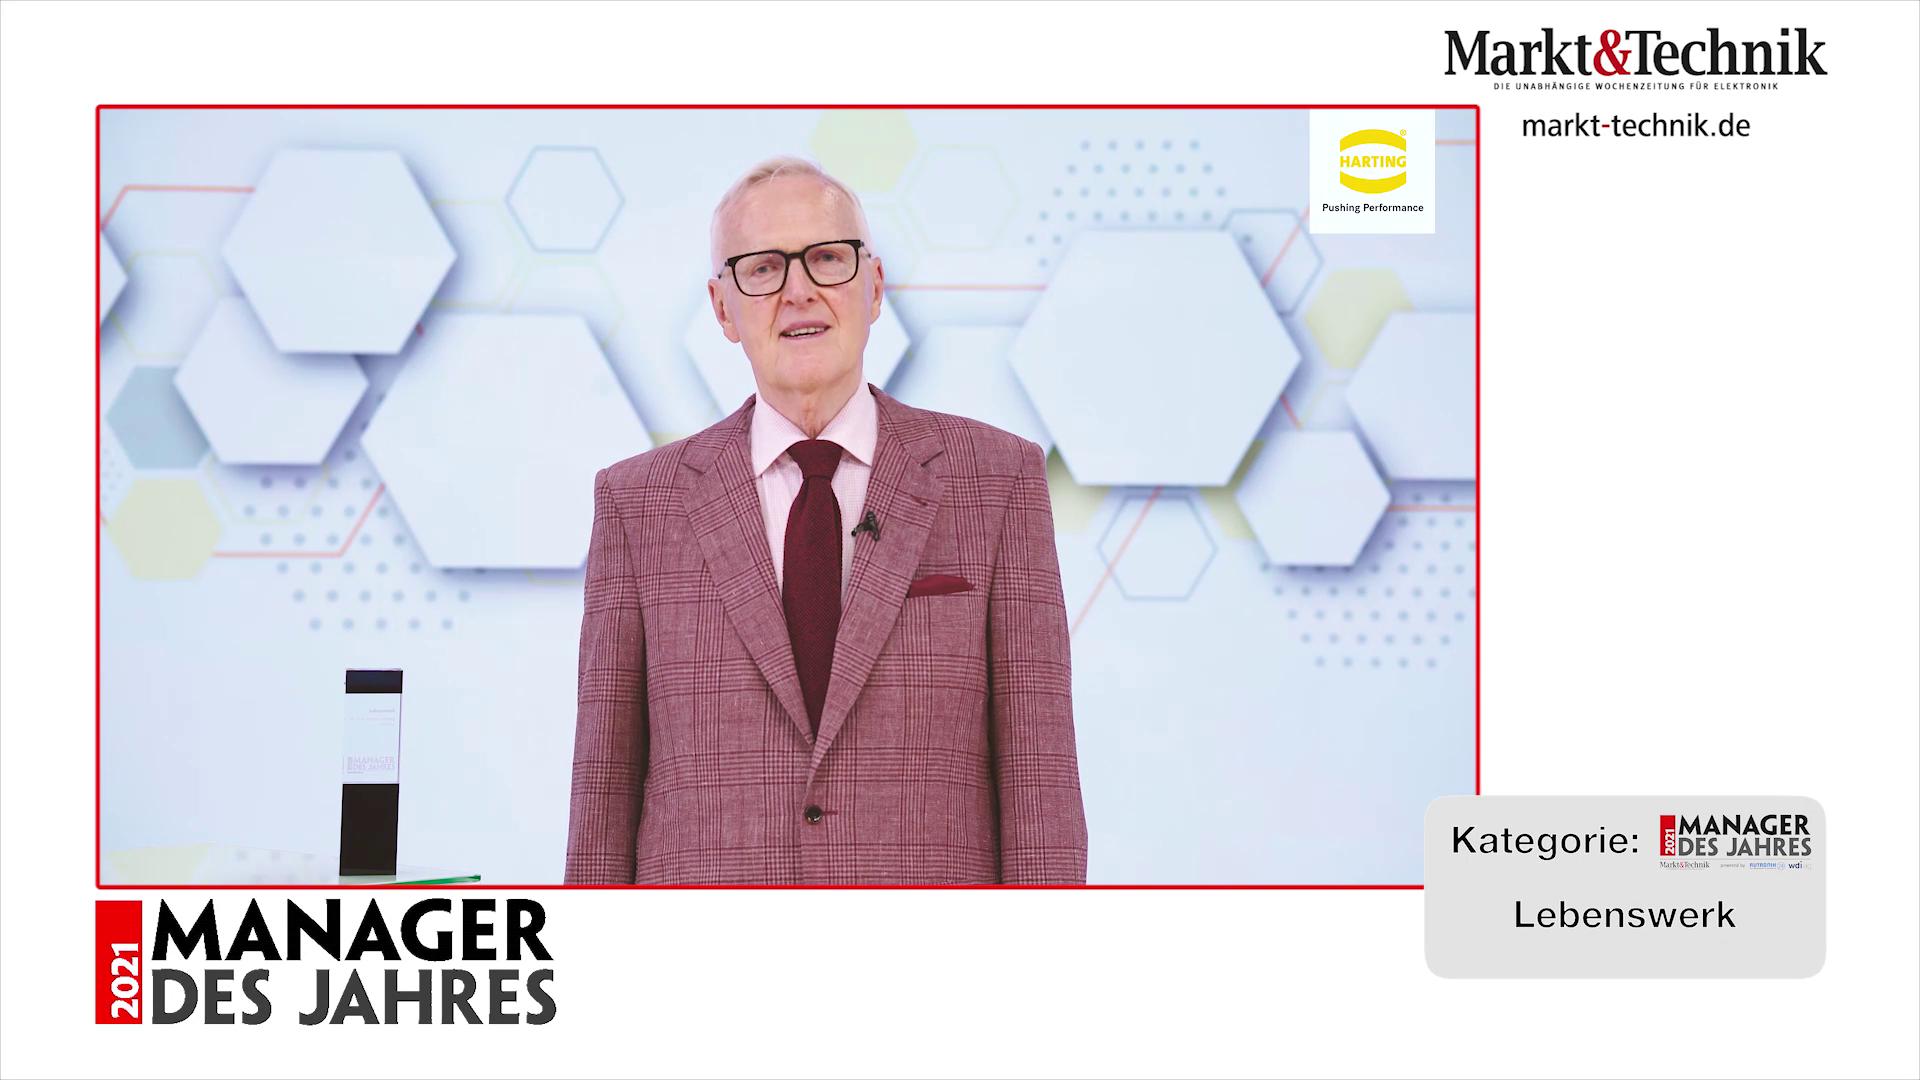 »Manager des Jahres 2021«: Dr. Dietmar Harting